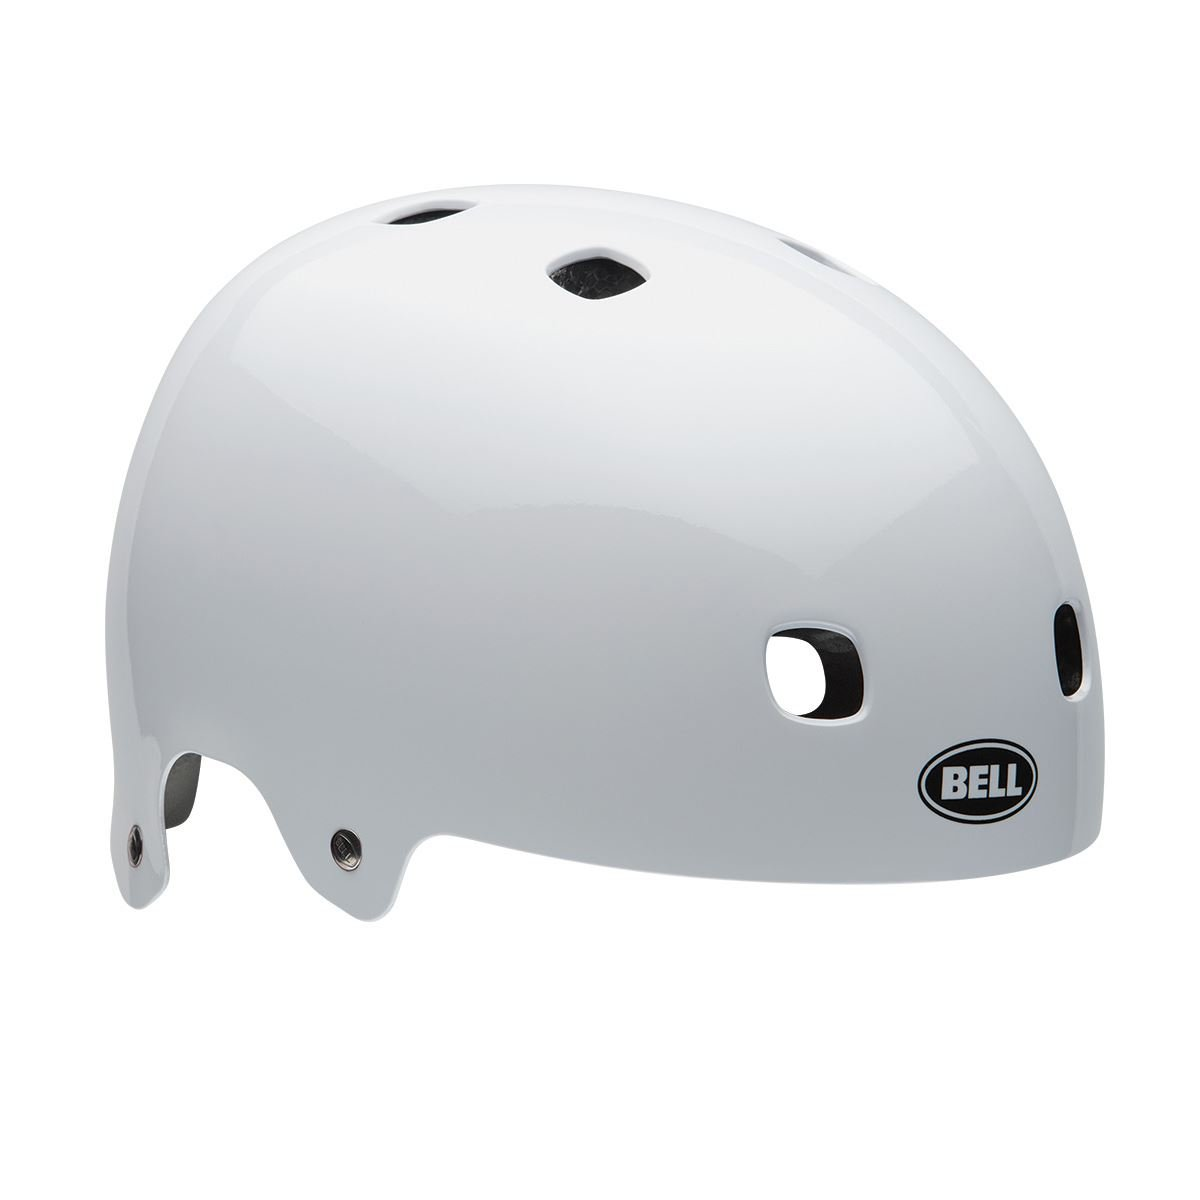 Bell Segment Jr. BMX-Fahrradhelm - white, Größe:S 51-55cm